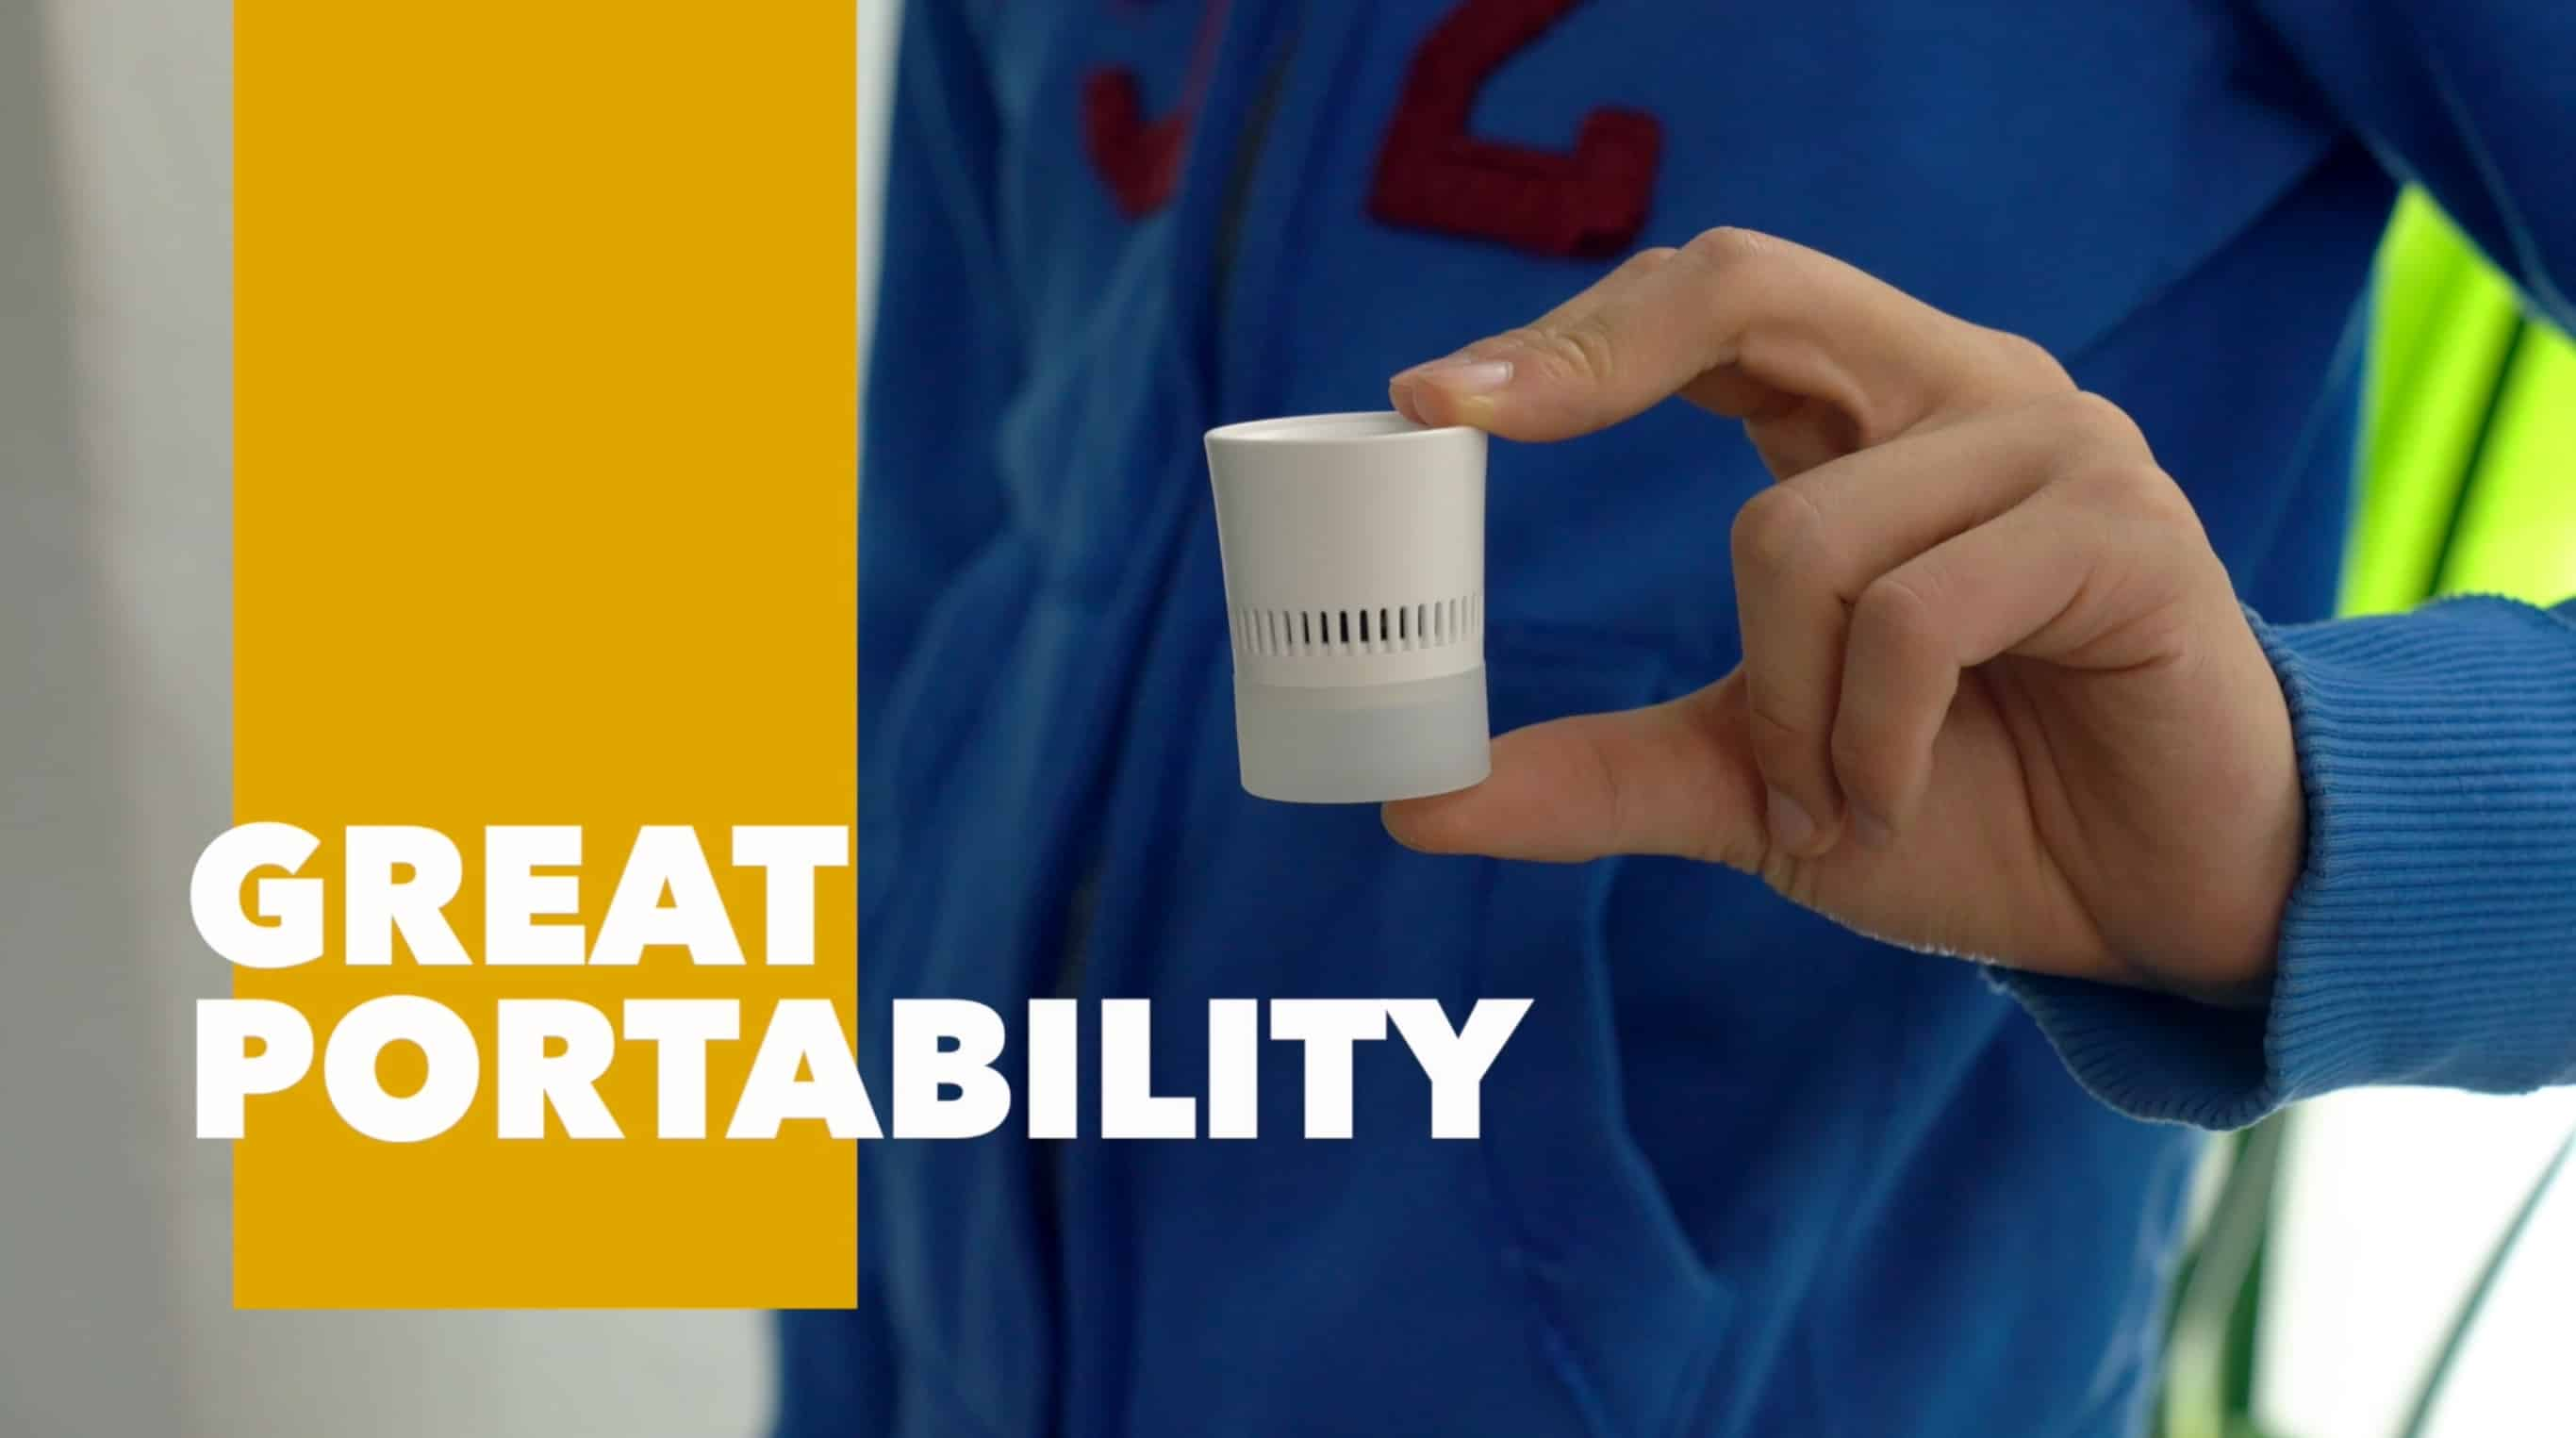 Cork 2 Bluetooth speaker can turn any bottle into a speaker